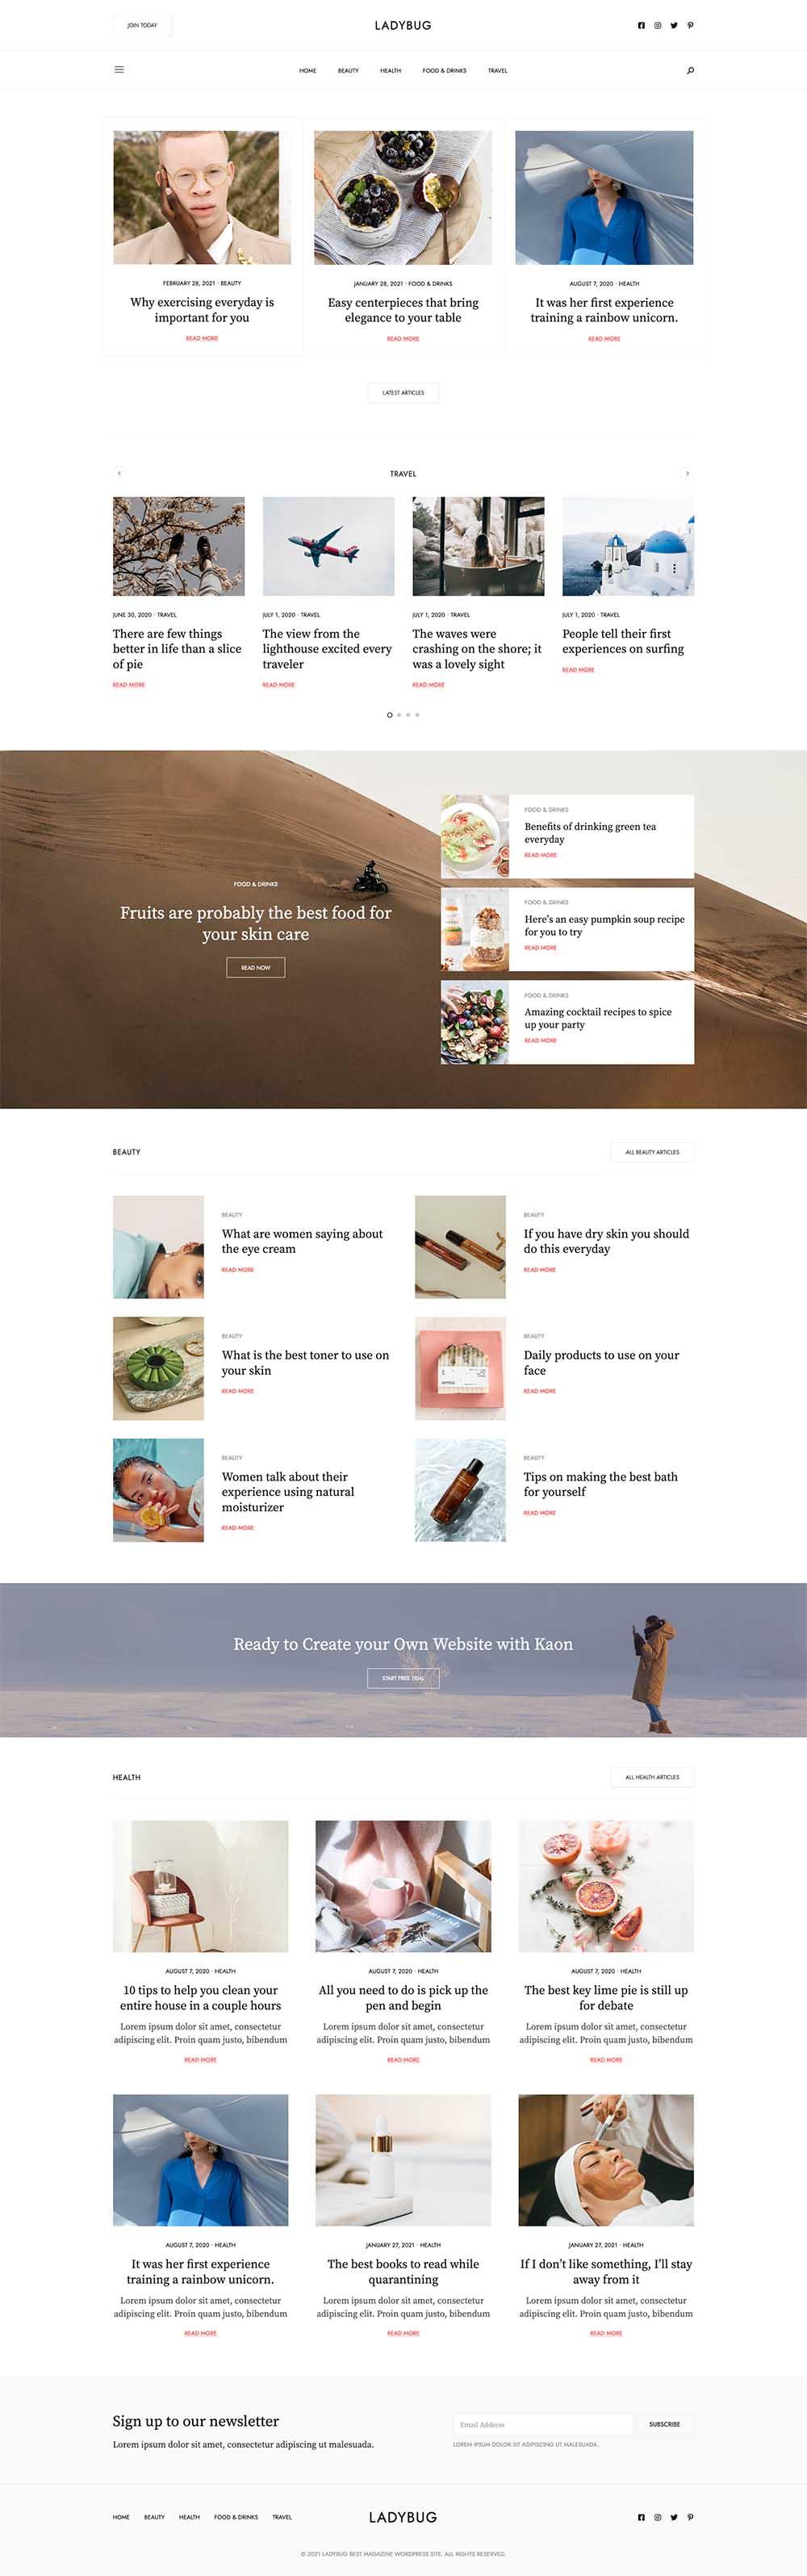 Ladybug Niche Blog Demo Website for WordPress